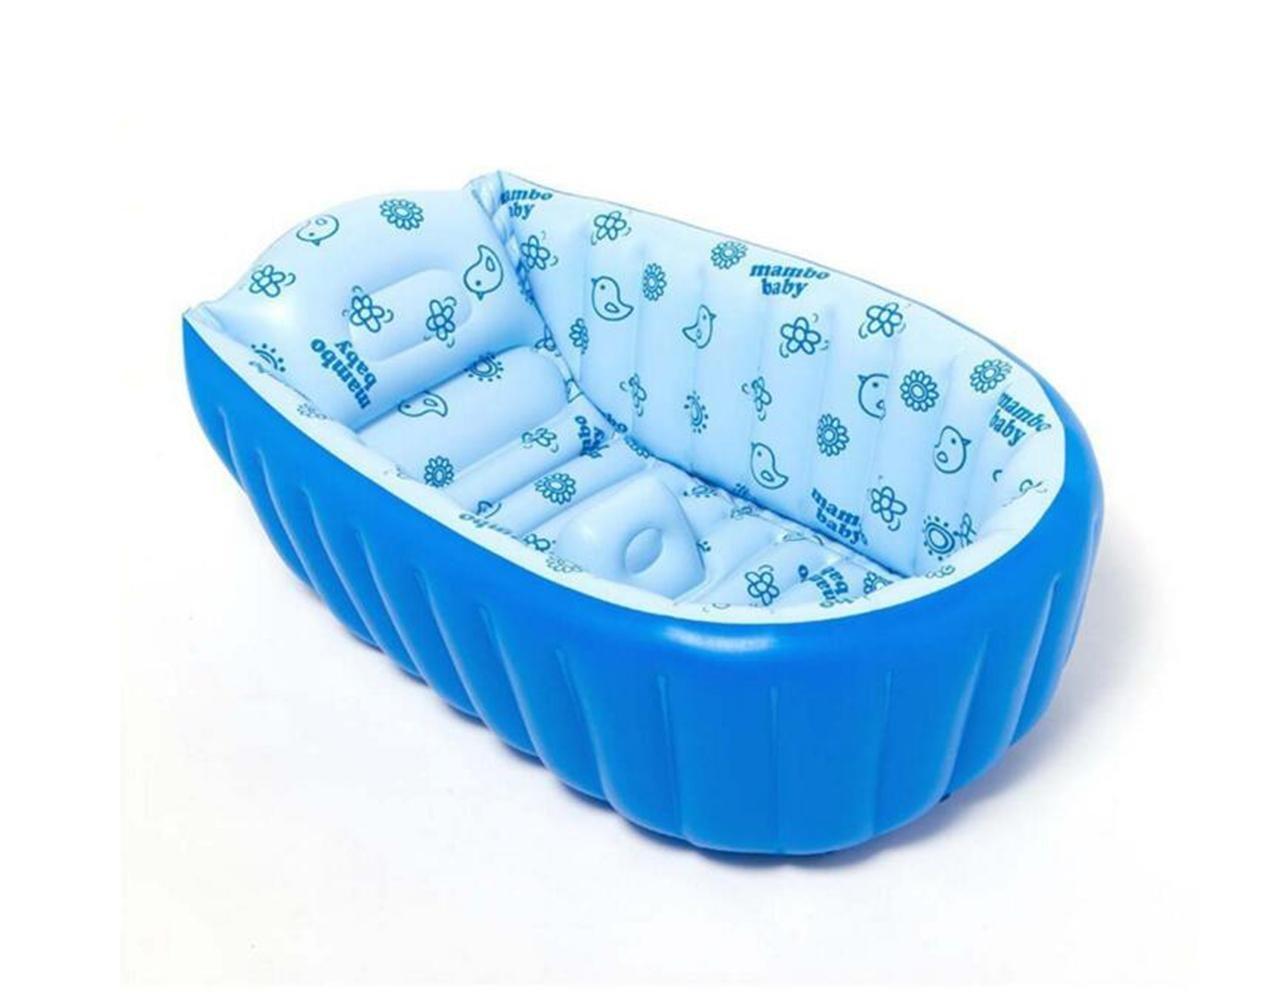 OOFWY Babybadewanne, Sommer-Baby-aufblasbare Badewanne, beweglicher Spielraum aufblasbare Wanne, Kinderbadewanne 0-3 Year Old Baby (90  45  28cm)